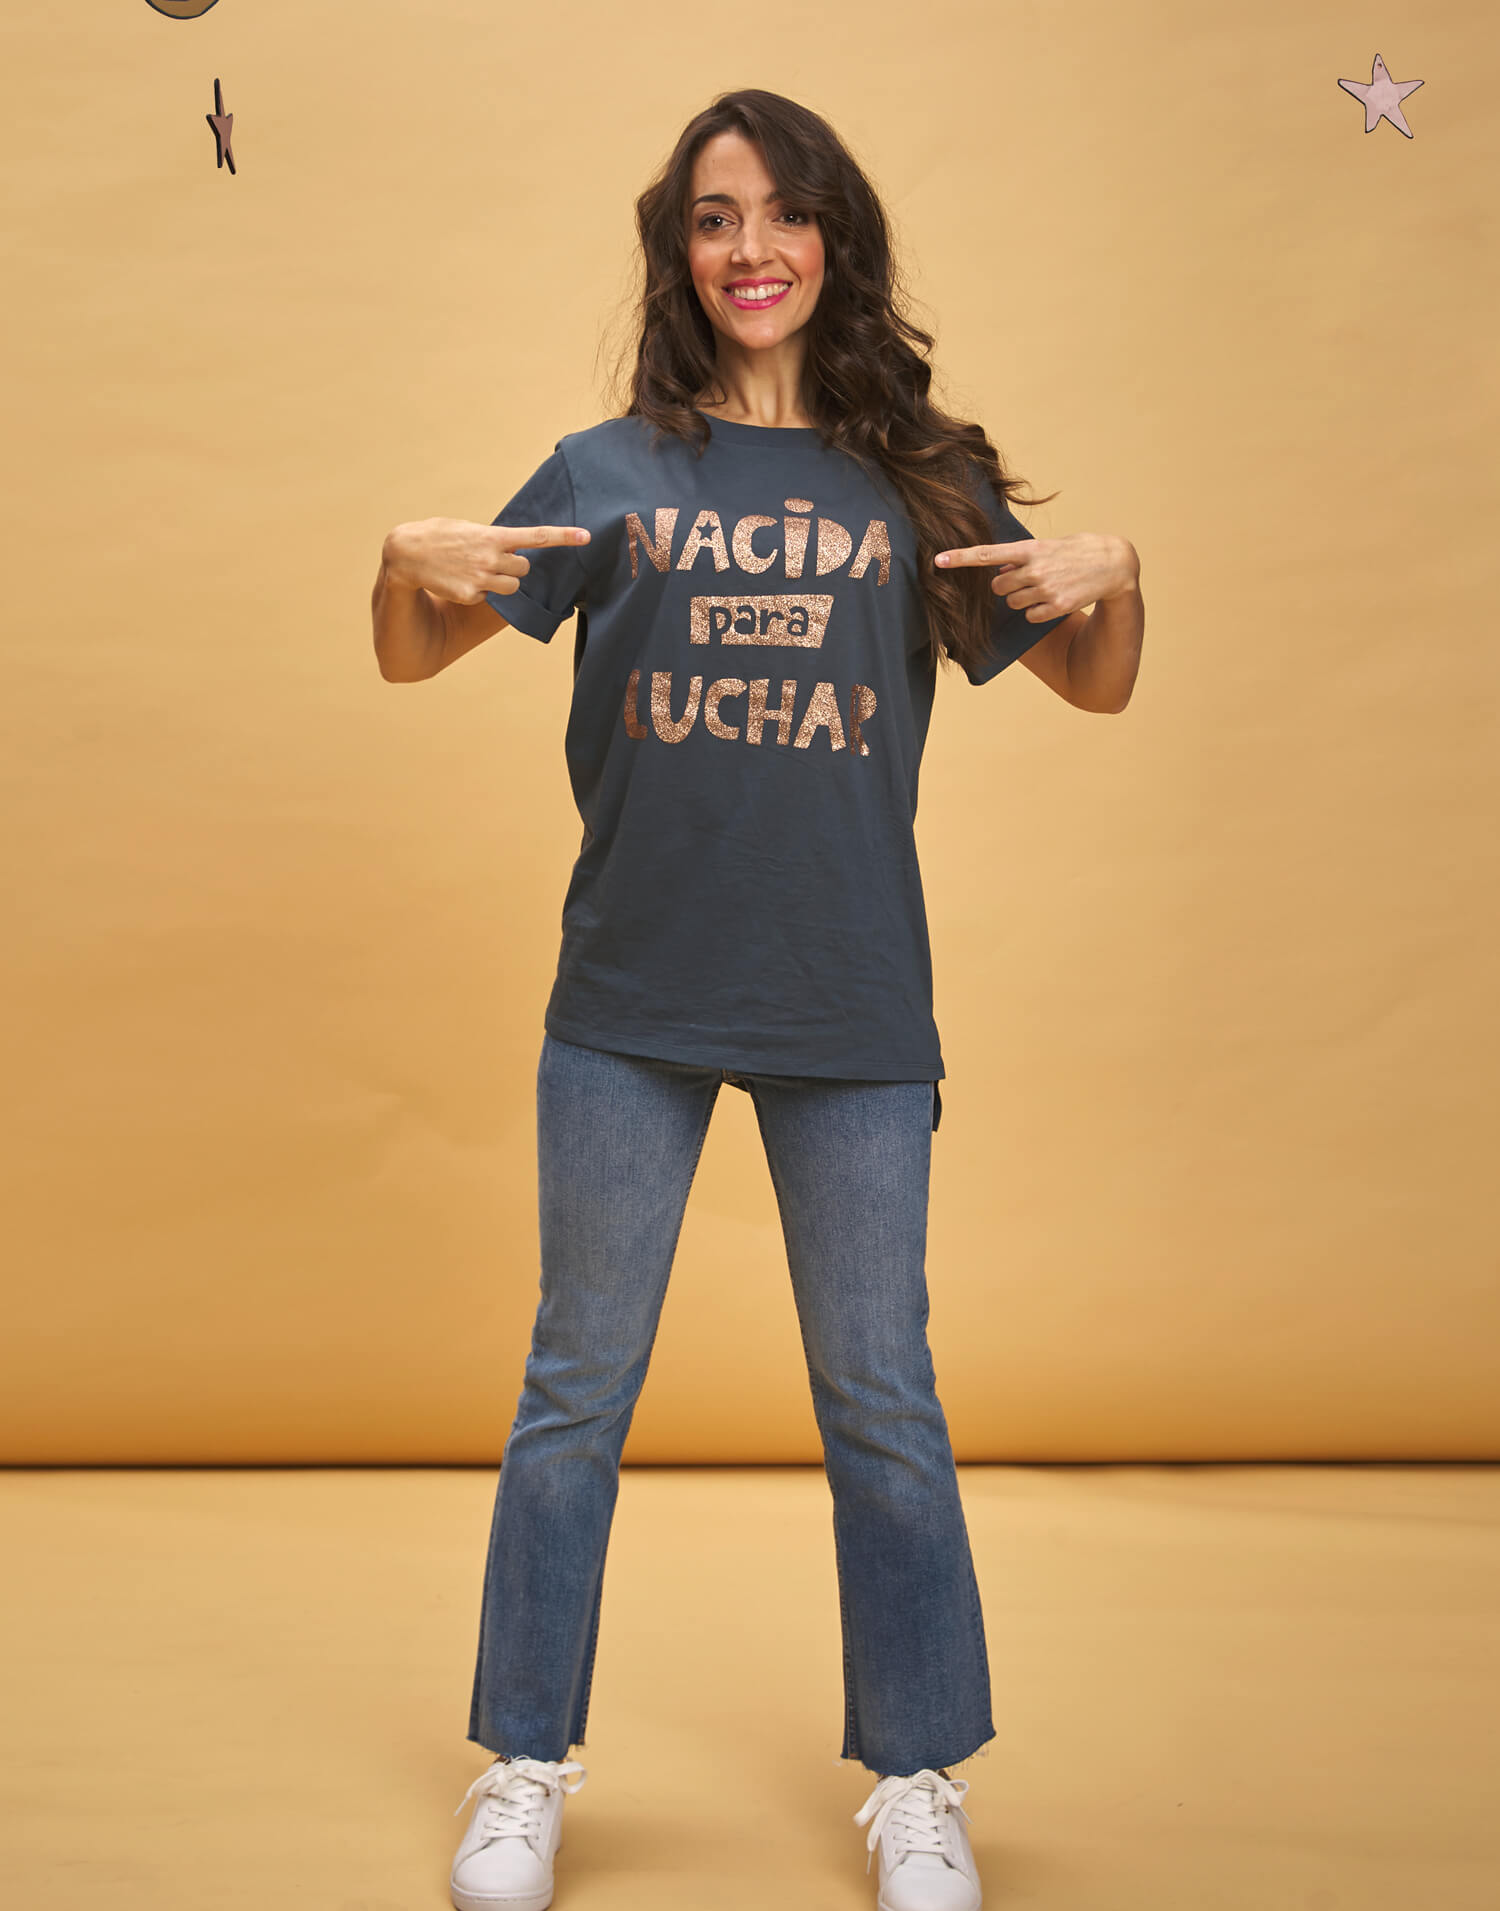 Camiseta de mujer 2019 'Nacida para luchar'